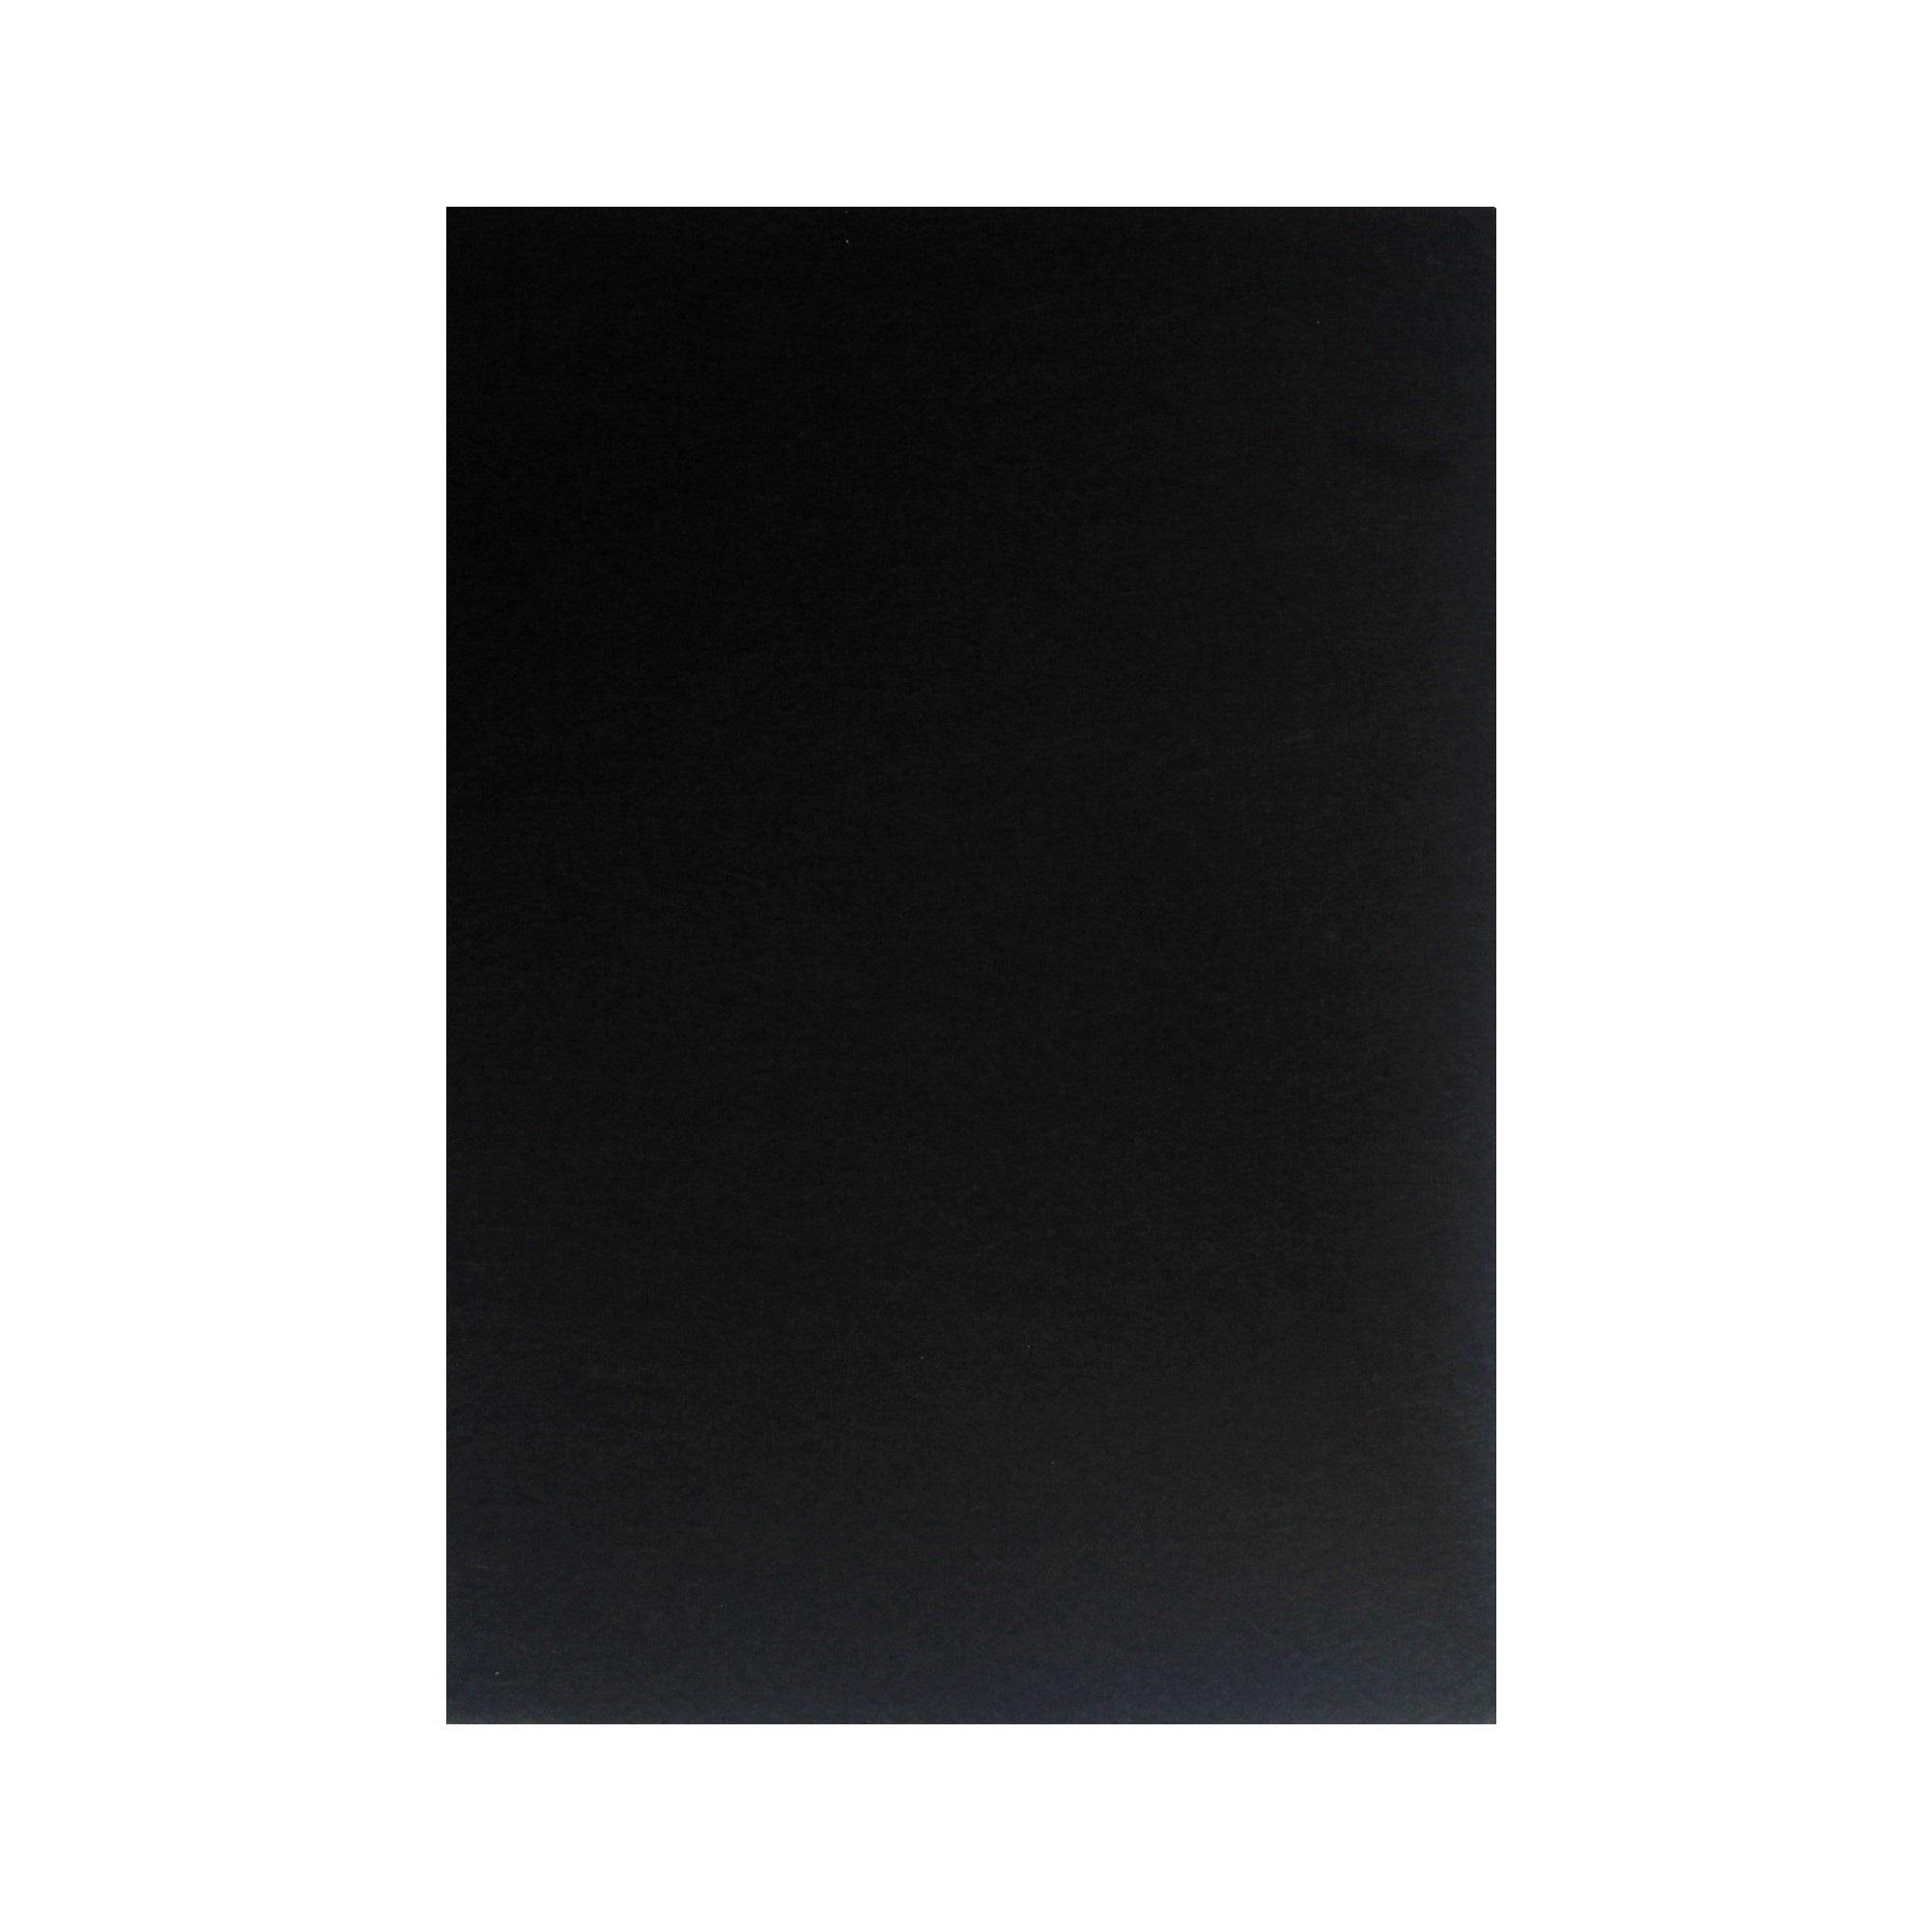 Filc czarny Brewis (10)